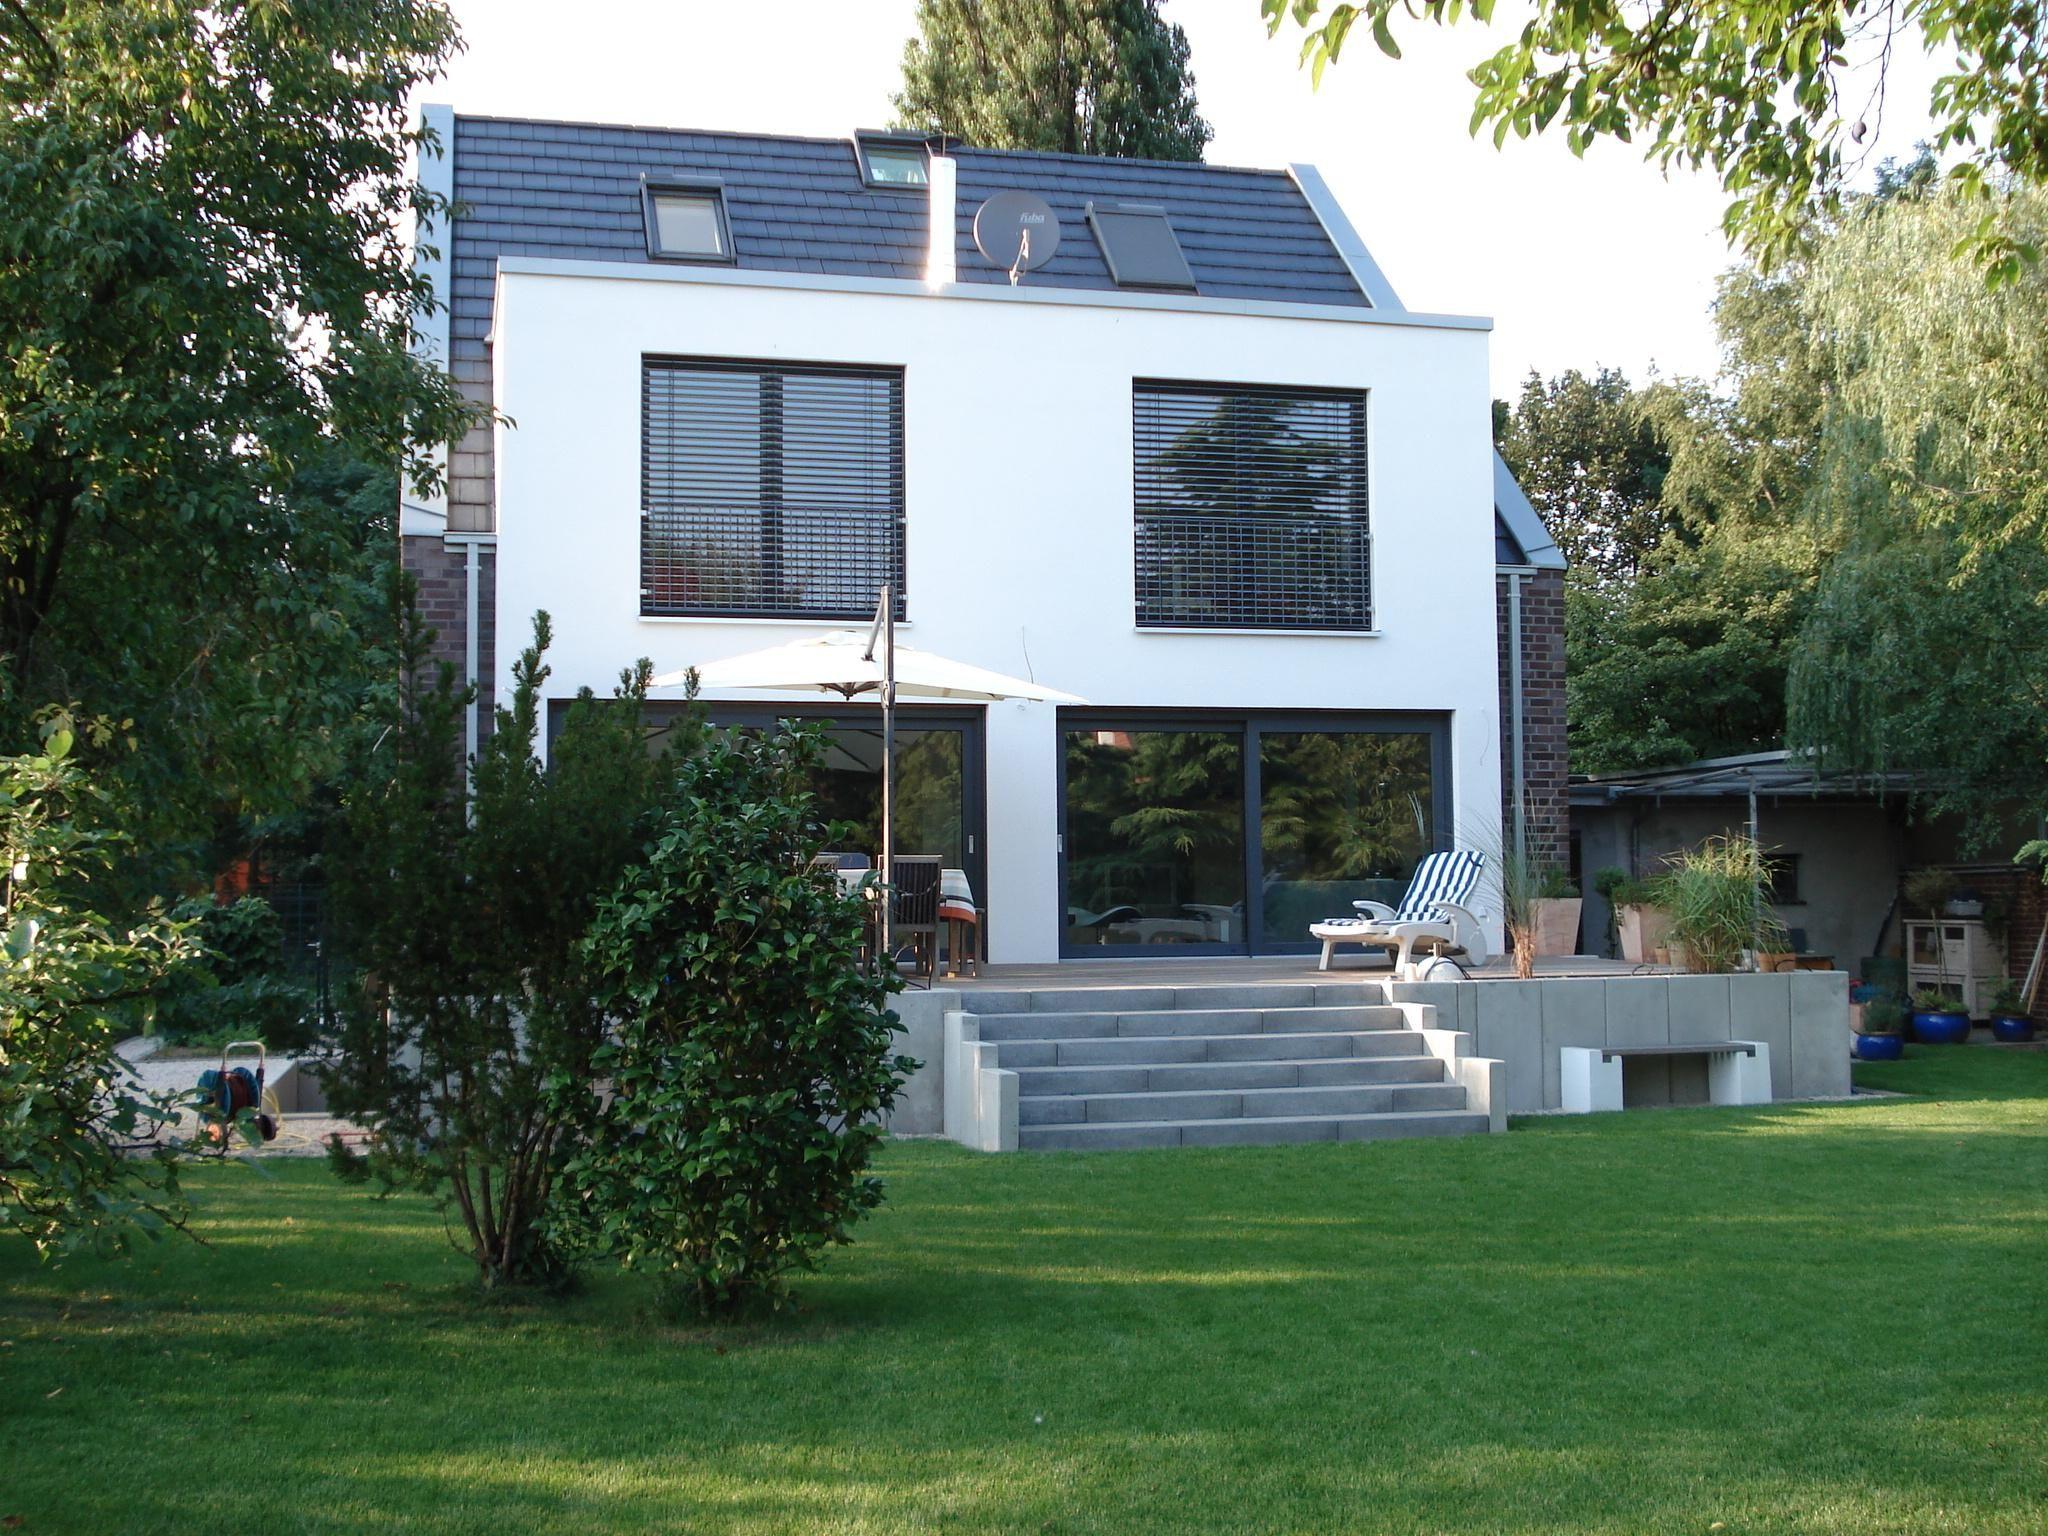 Hausumbau Vorher Nachher  Googlesuche  New House  Haus